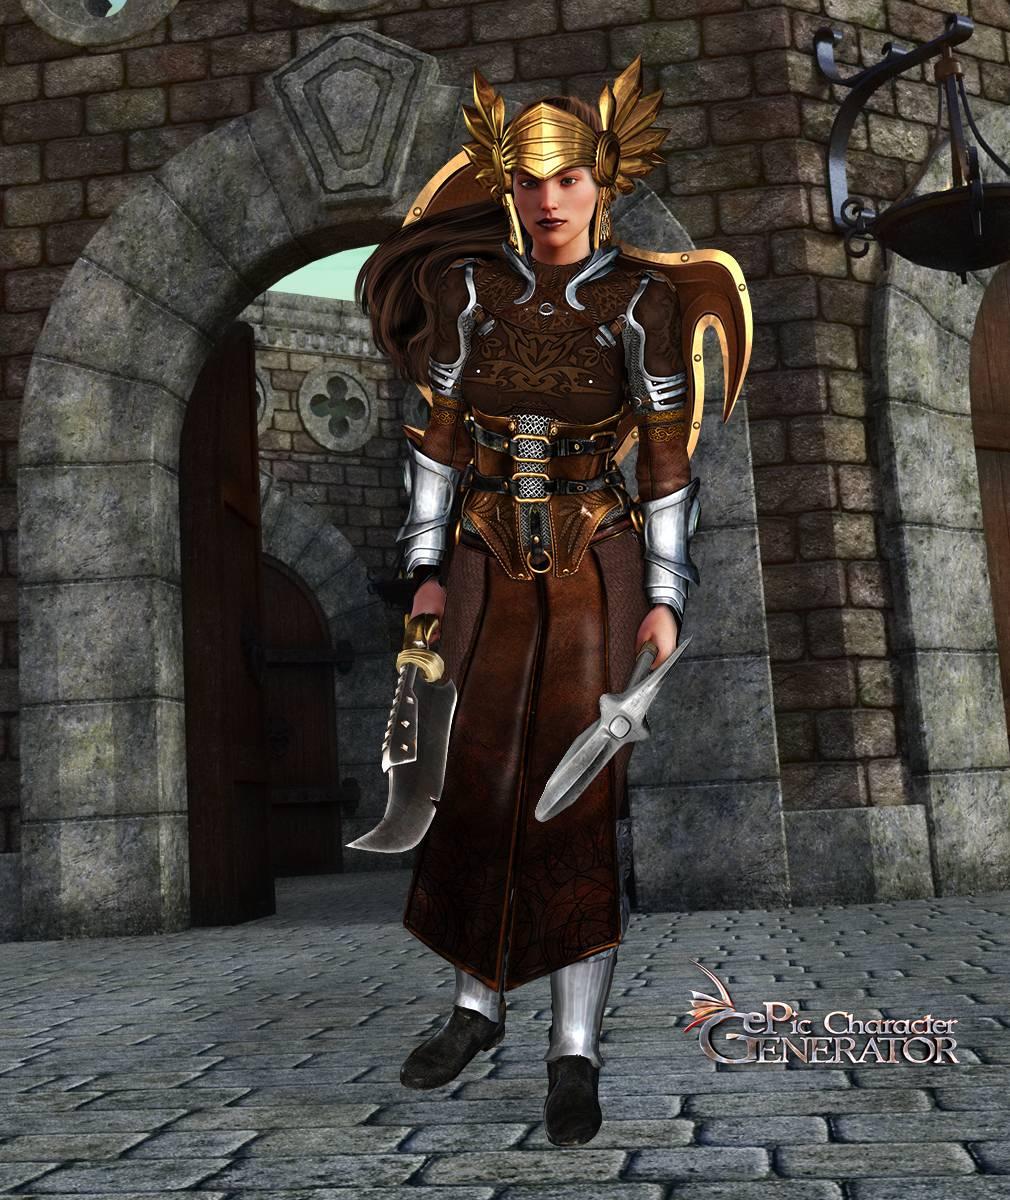 ePic Character Generator Season 2 Female Warrior Screenshot 06